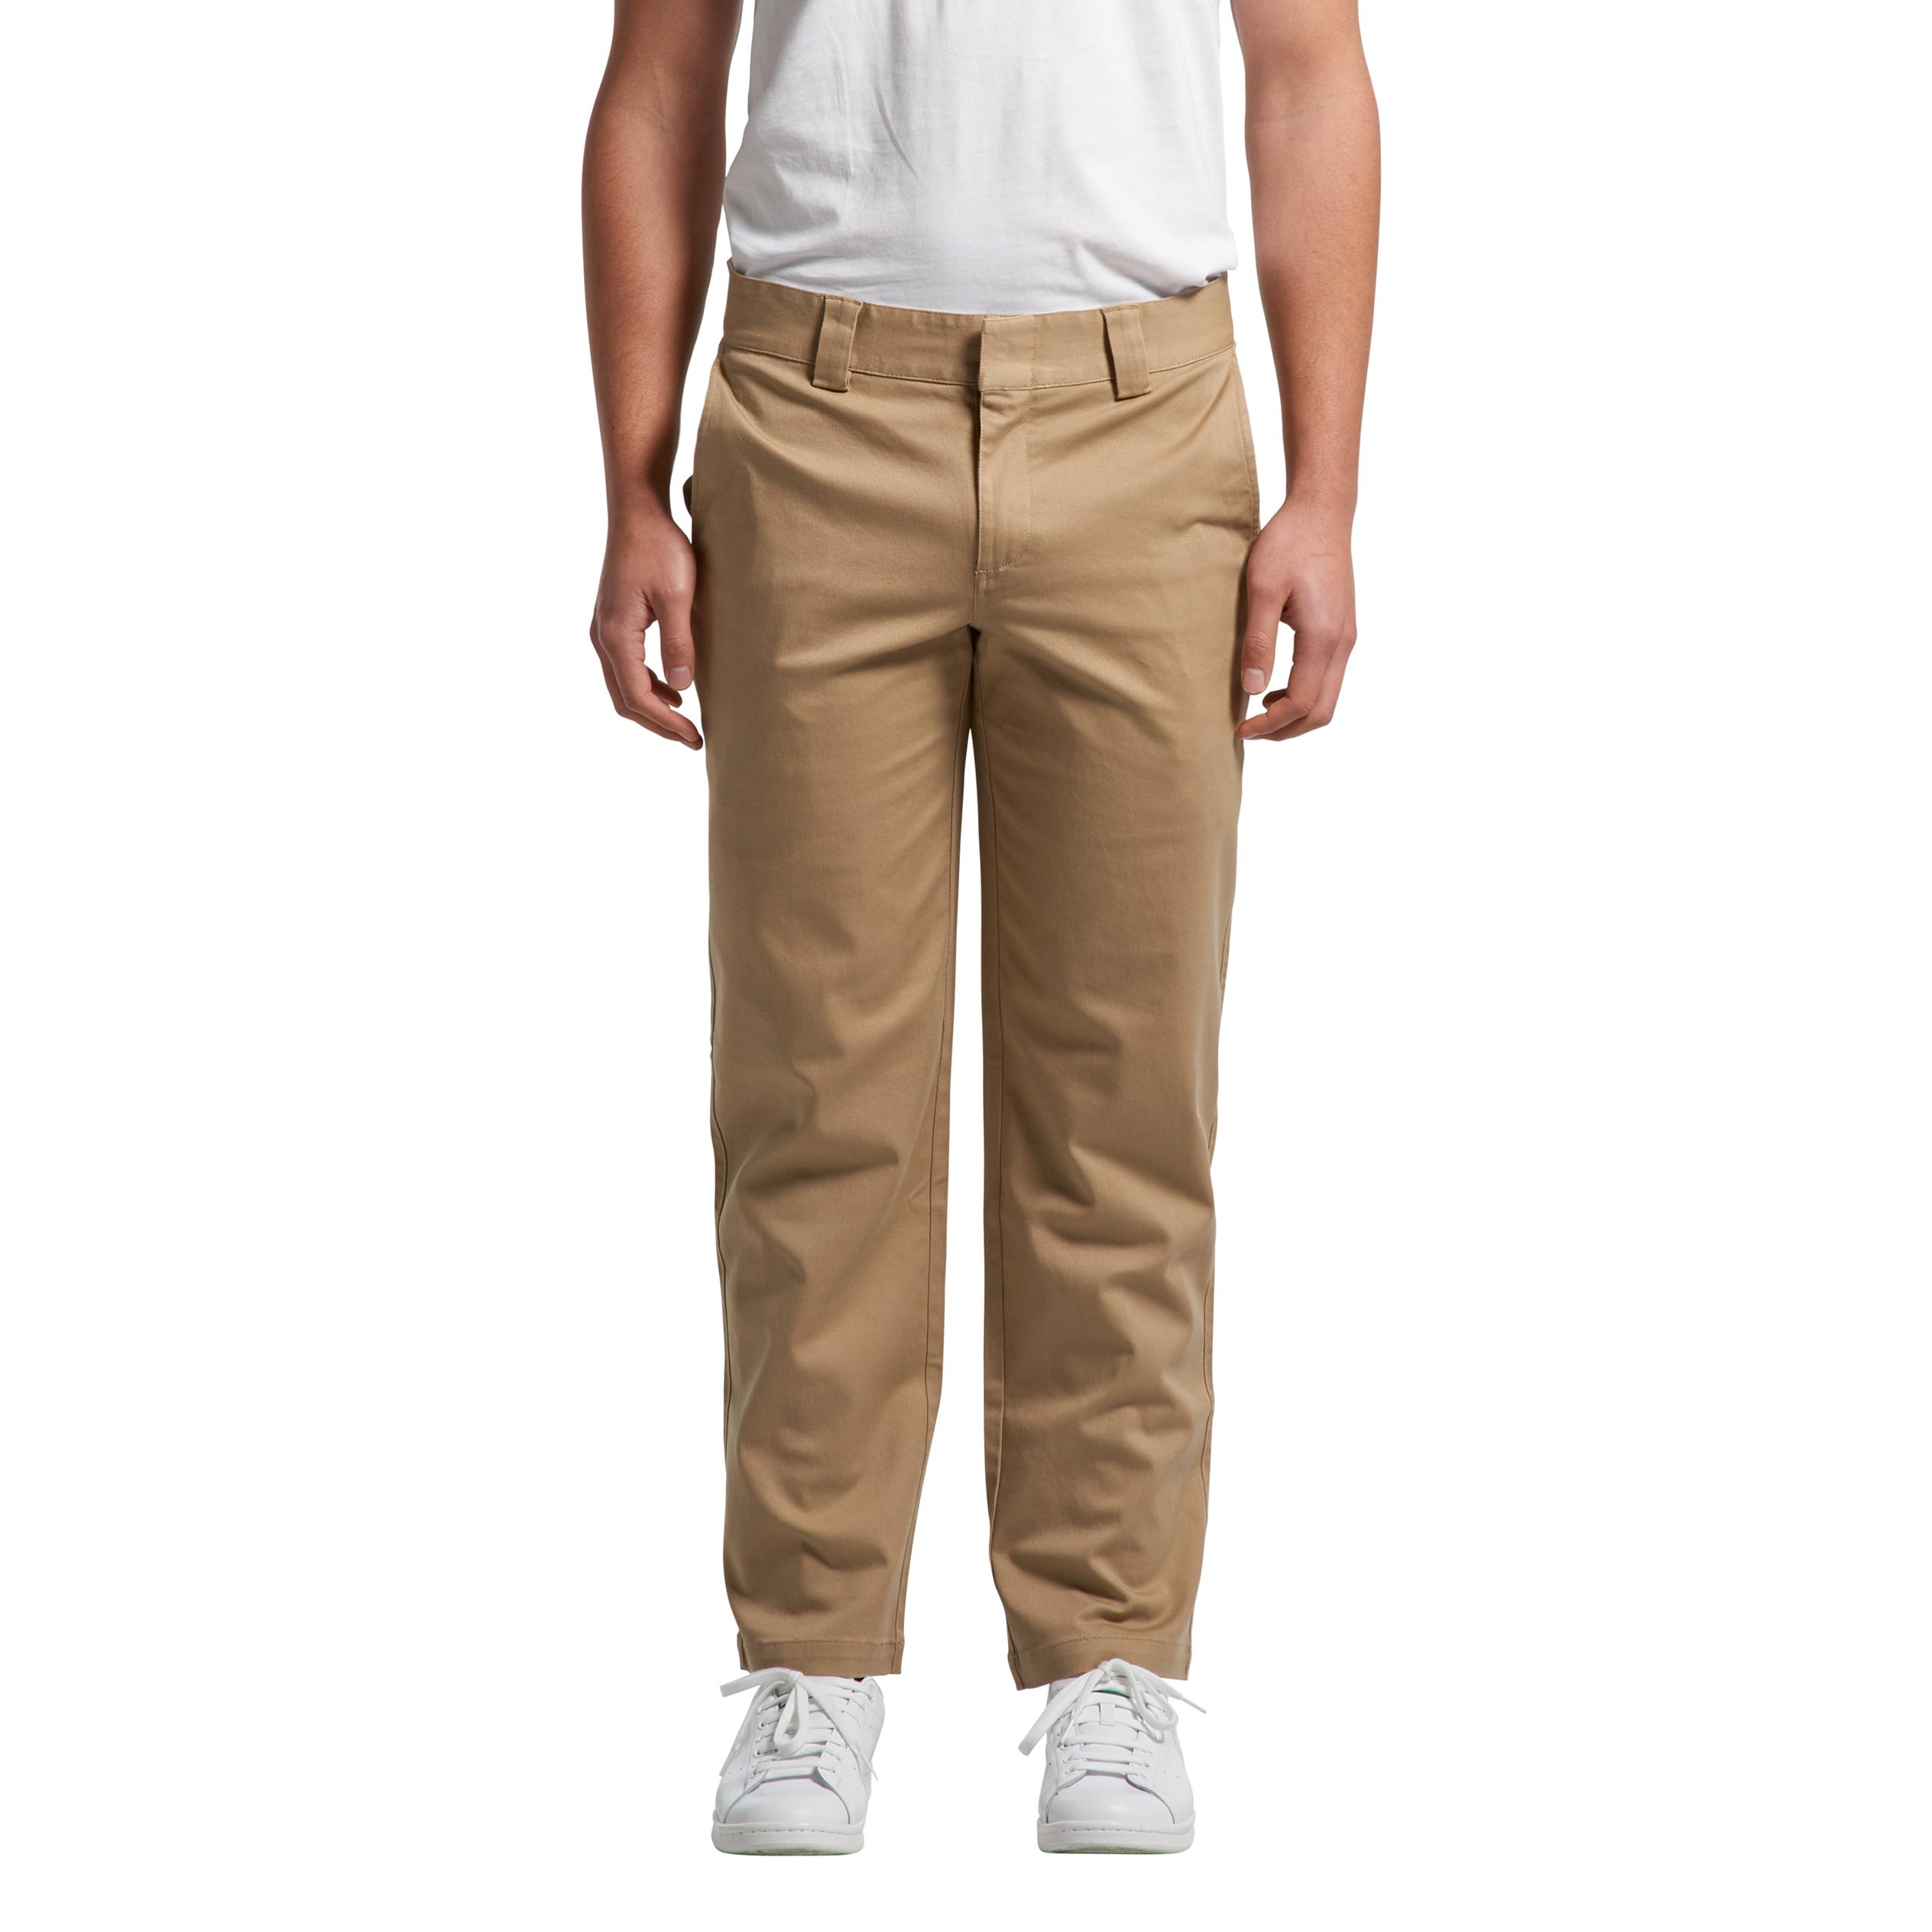 Regular Pants (5914_AS)